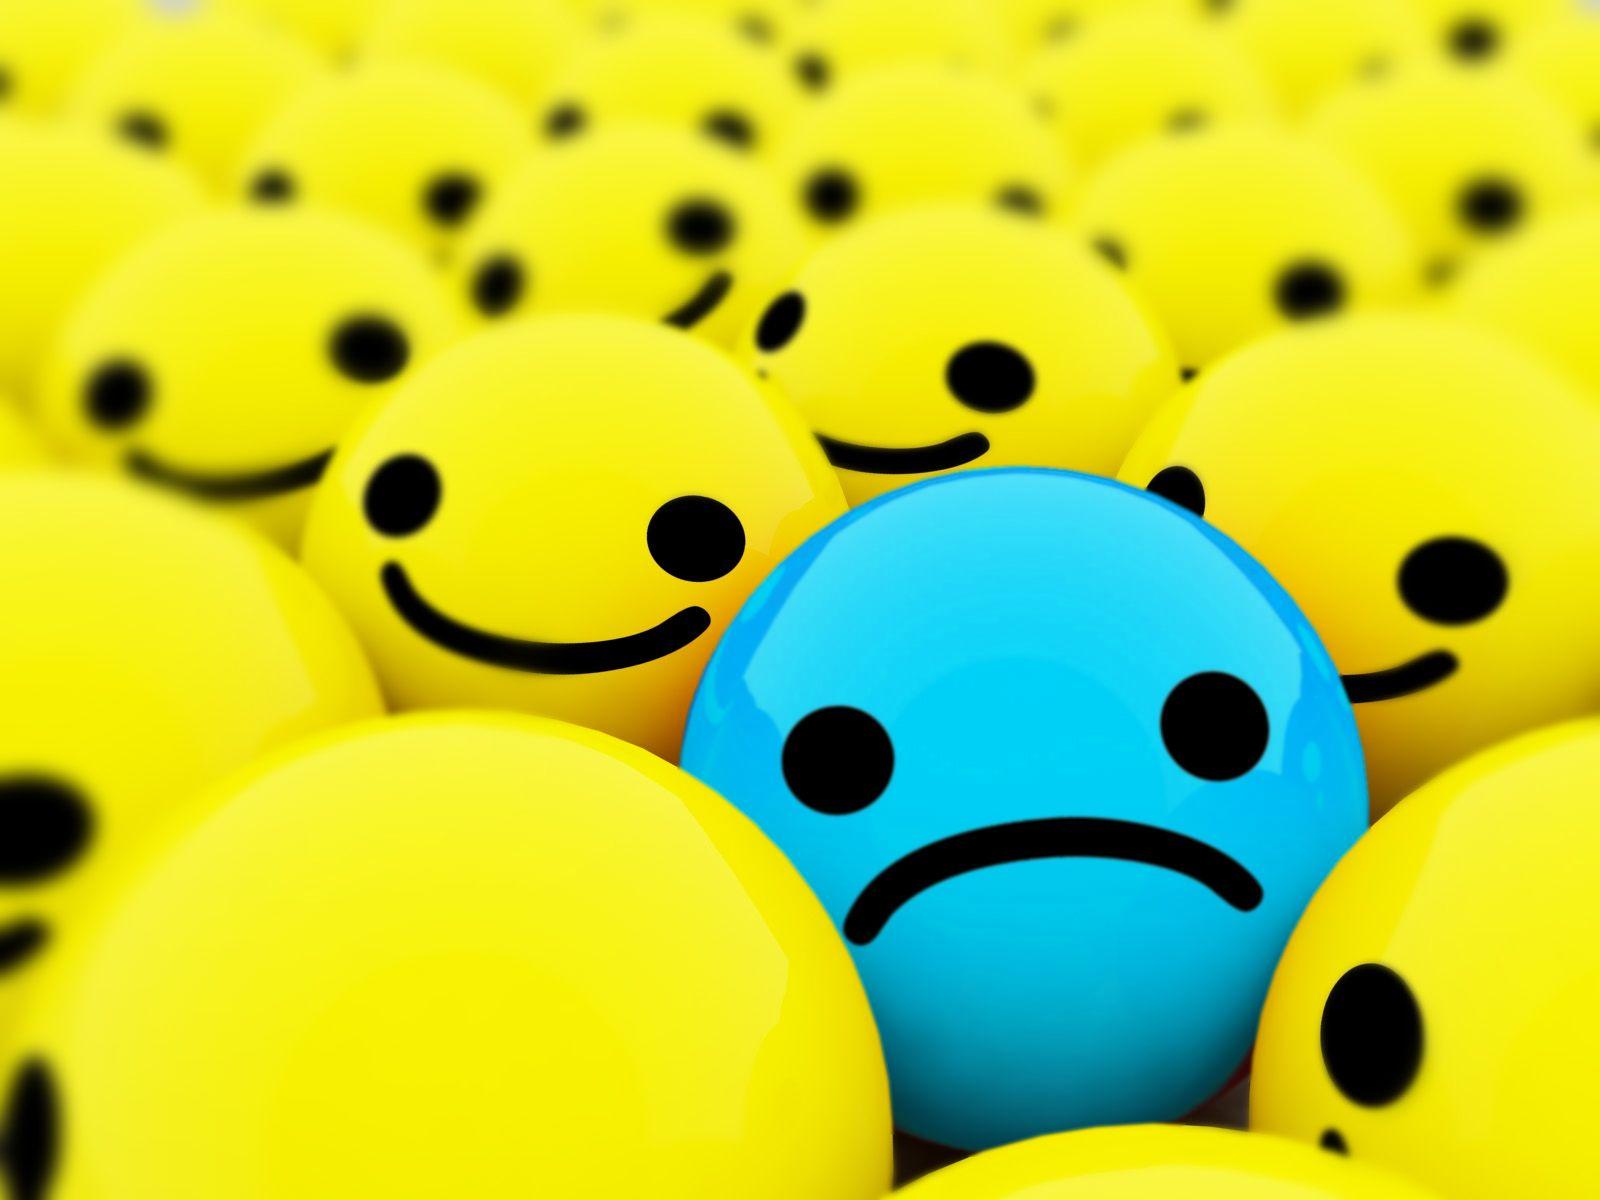 Sad Face Wallpaper - ClipArt Best | smiley faces & emoji's ...